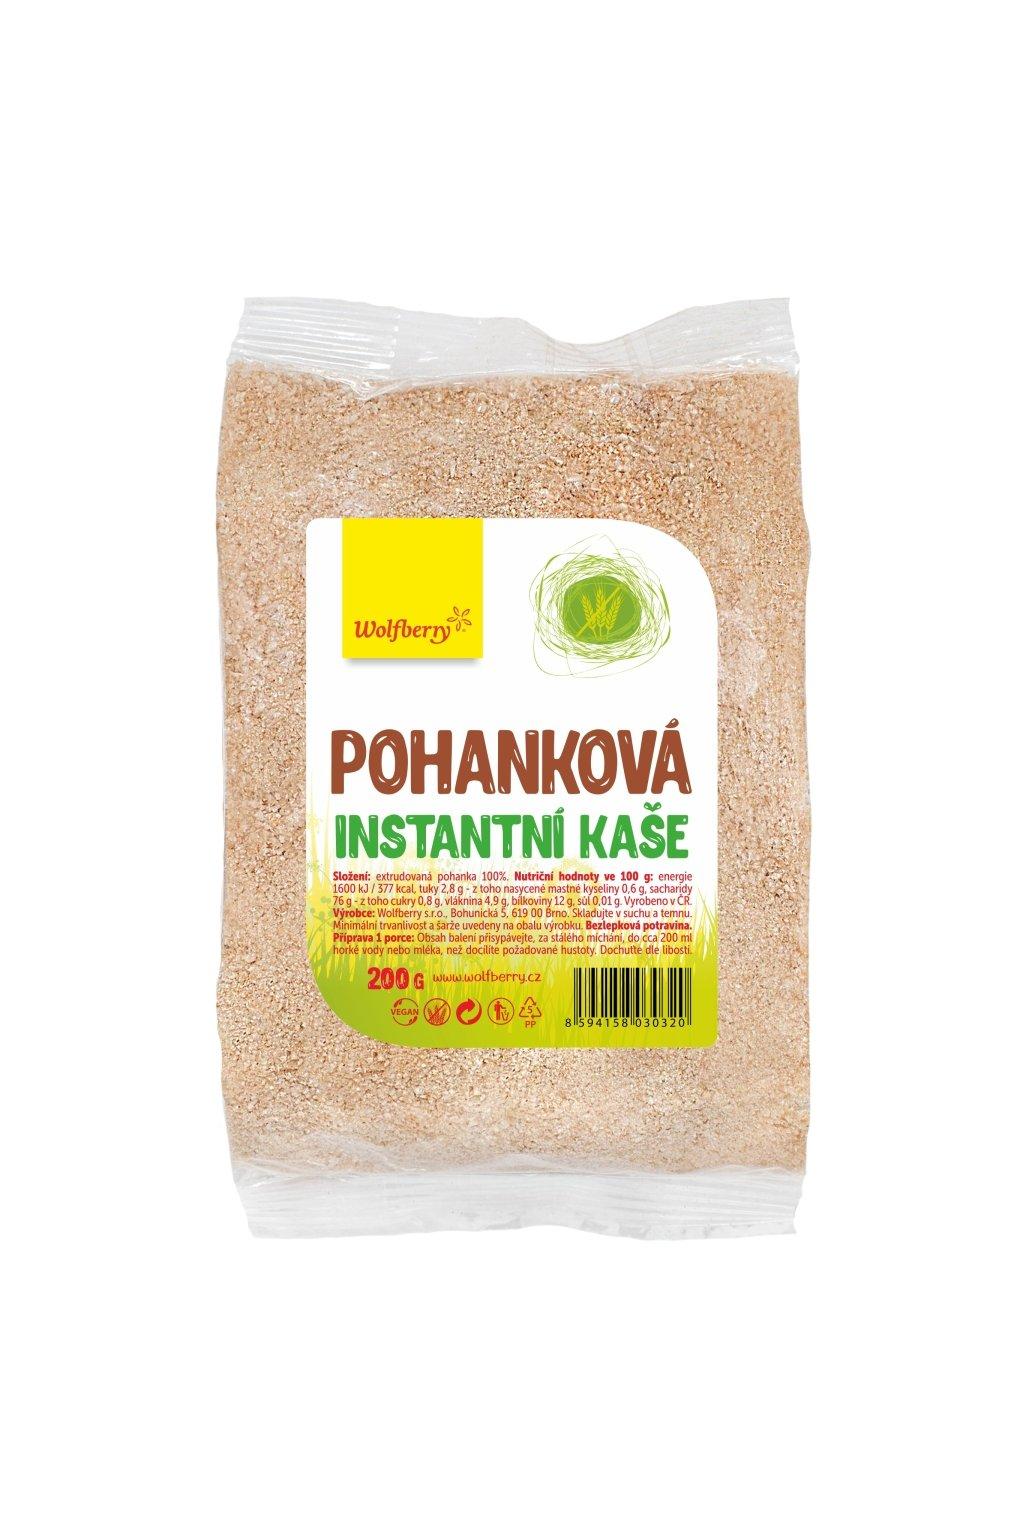 wolfberry pohankova kase 200 g 2157923 1000x1000 fit